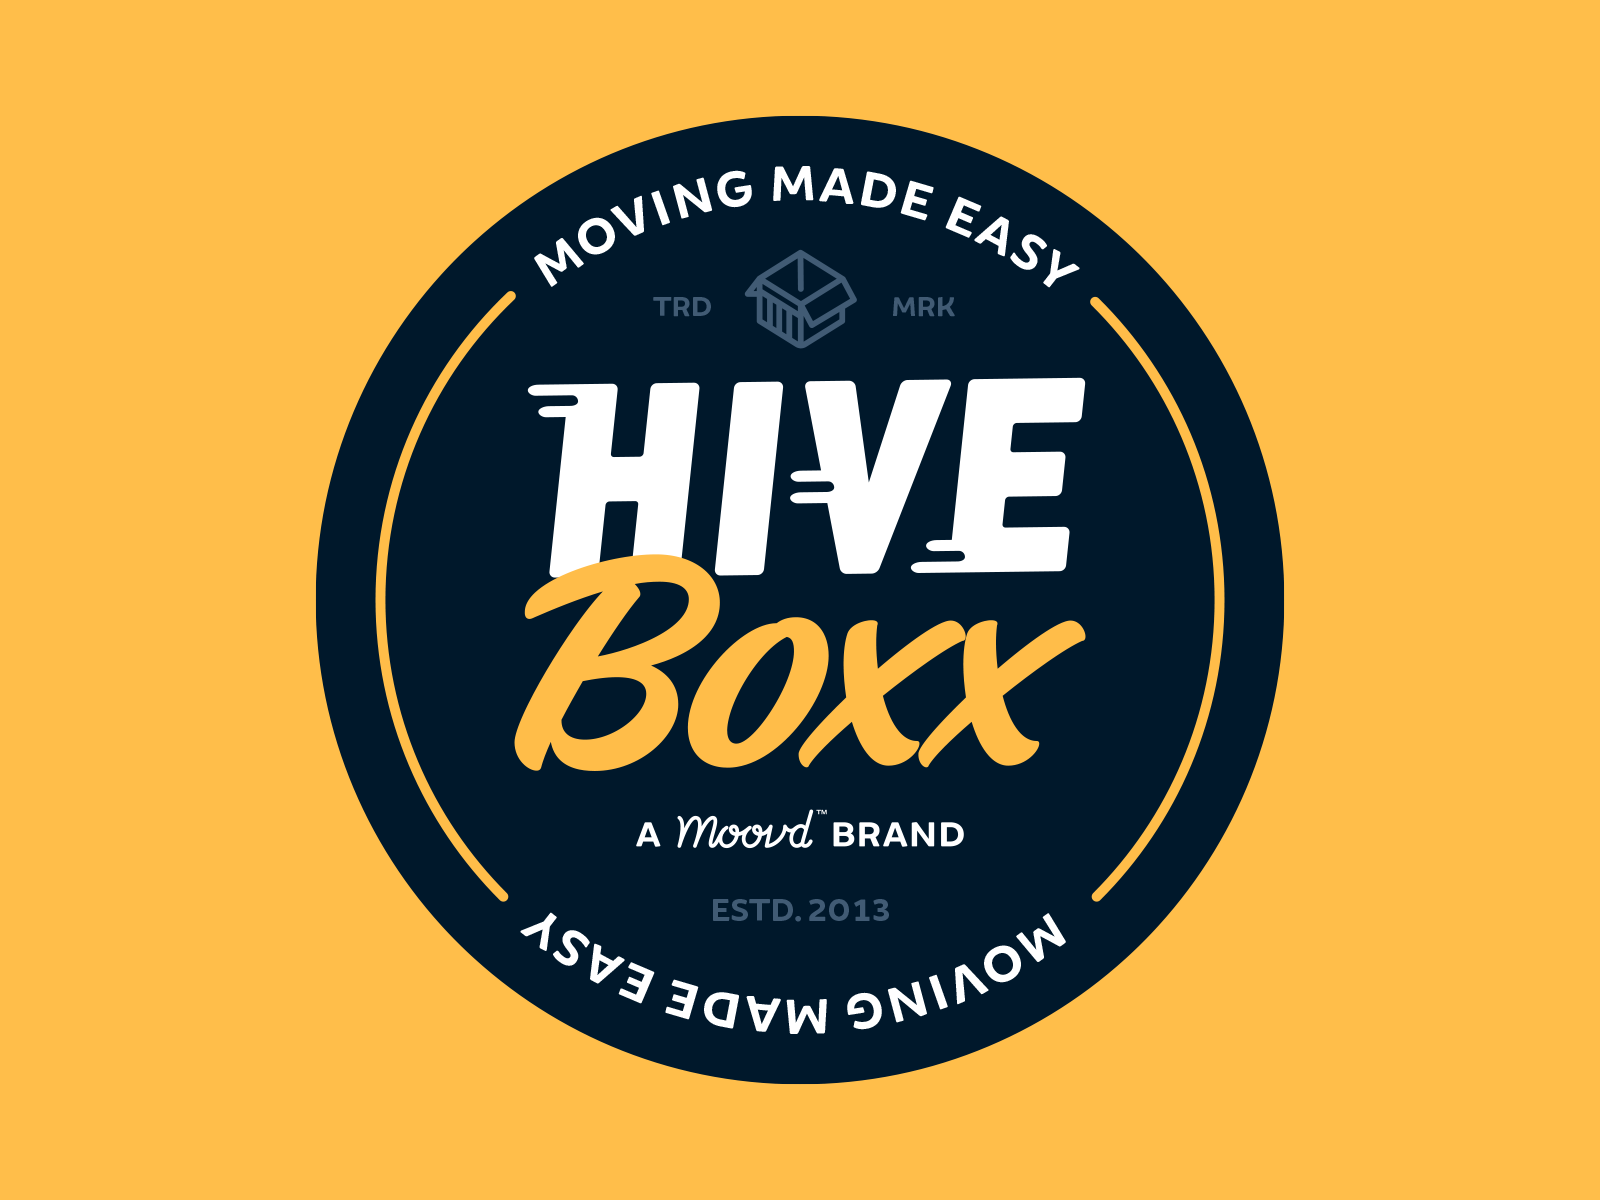 dribbble_branding_hiveboxx_rockyroark